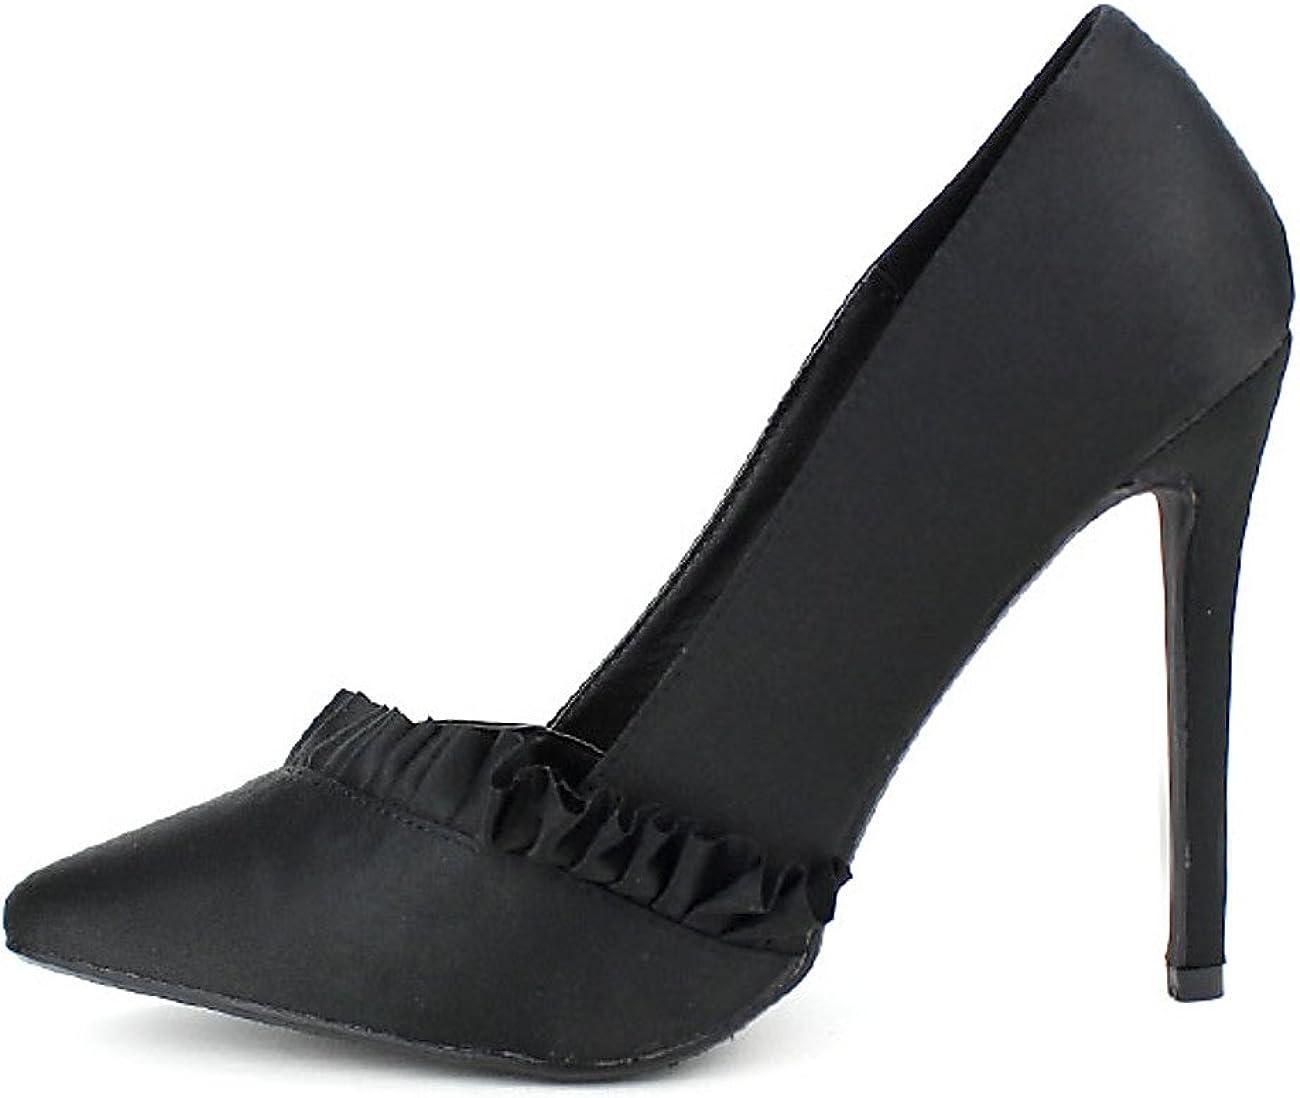 Cendriyon, Escarpins Noirs C'M Tania Chaussures Femme Taille